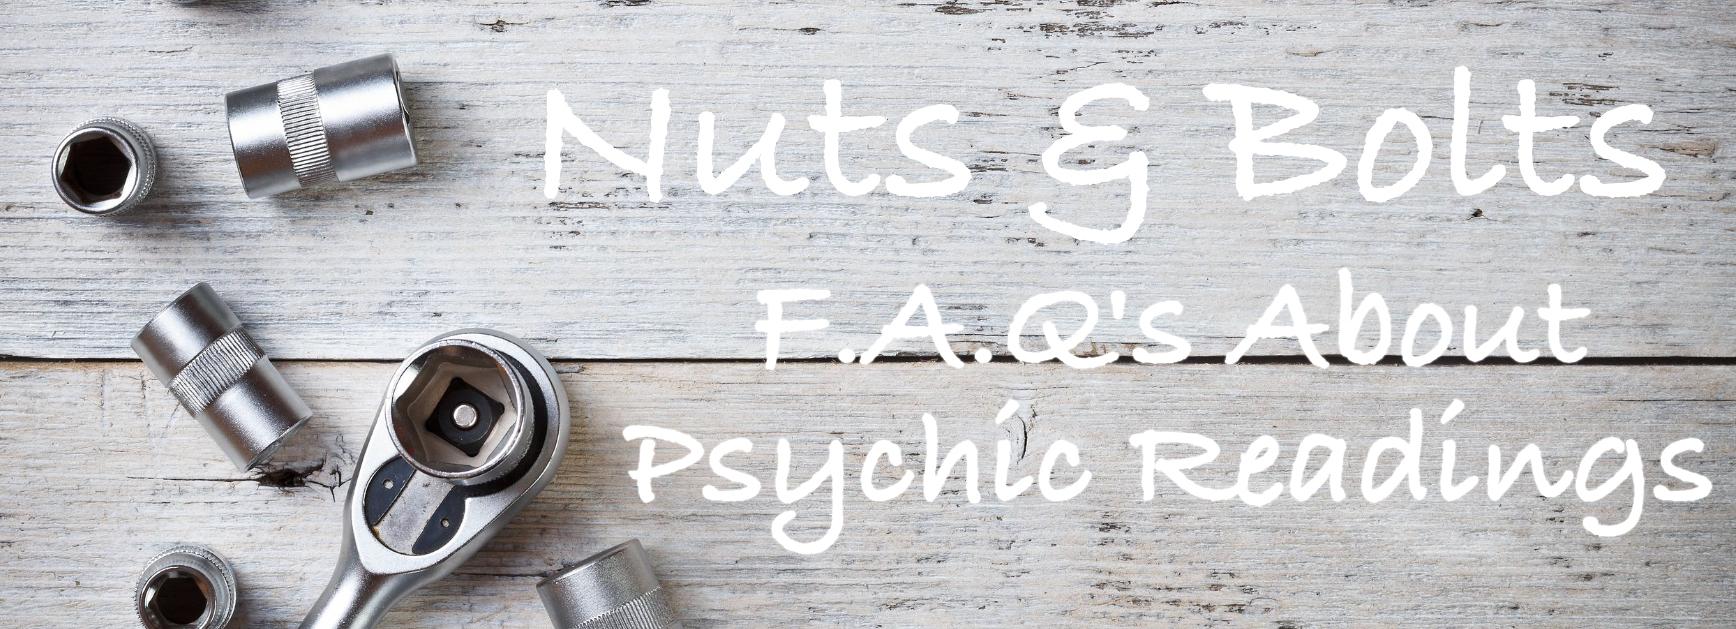 Nuts and Bolts David William Psychic Medium.jpg